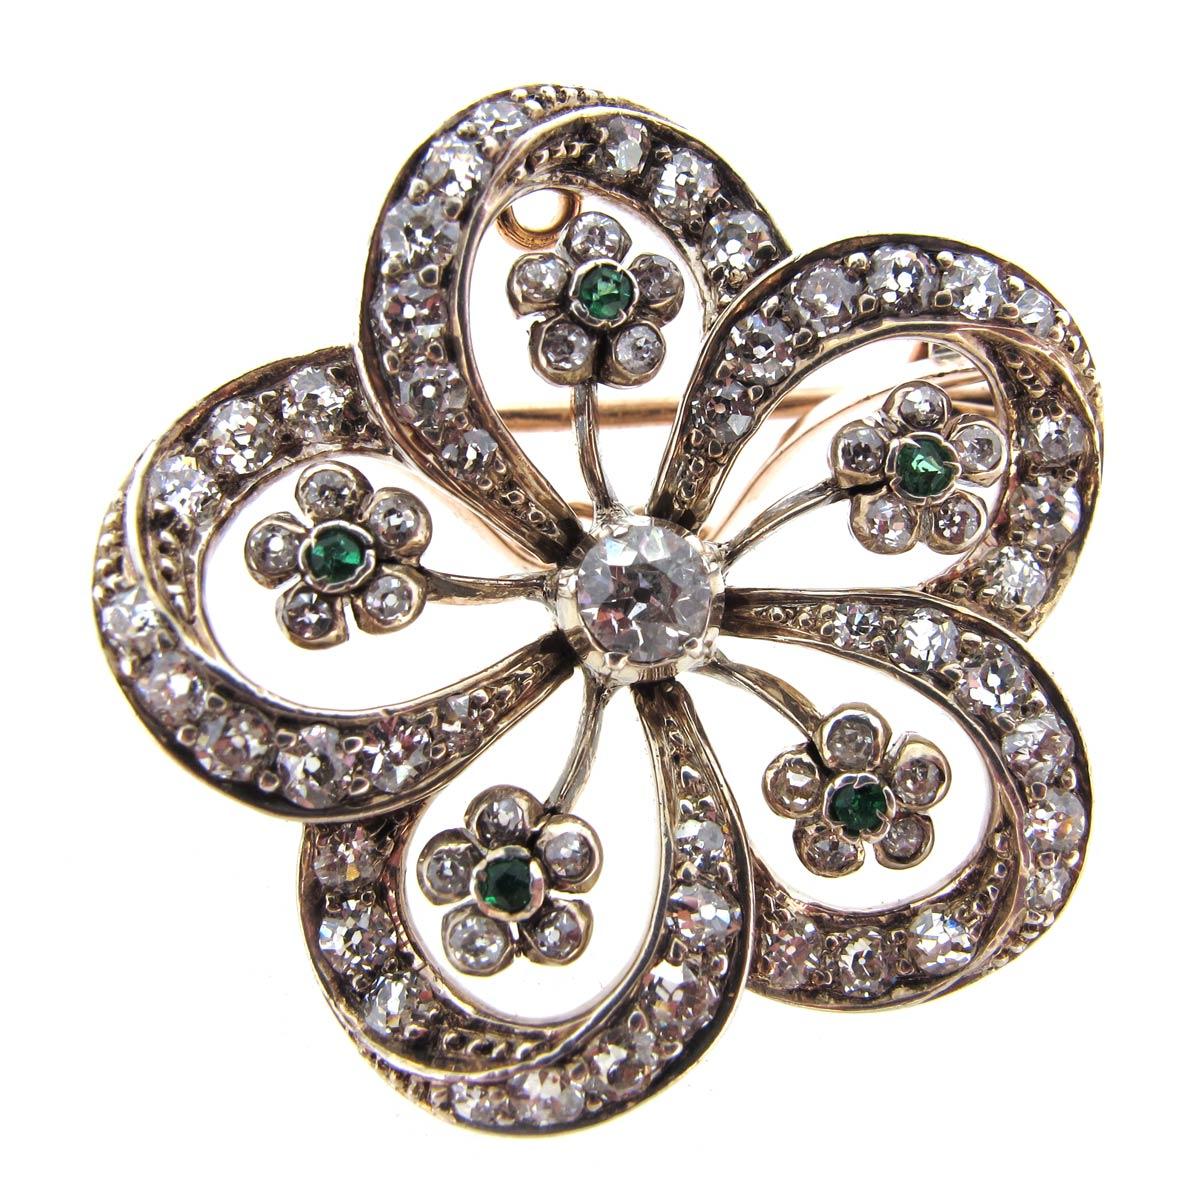 Antique Diamond & Emerald Brooch/ Pendant